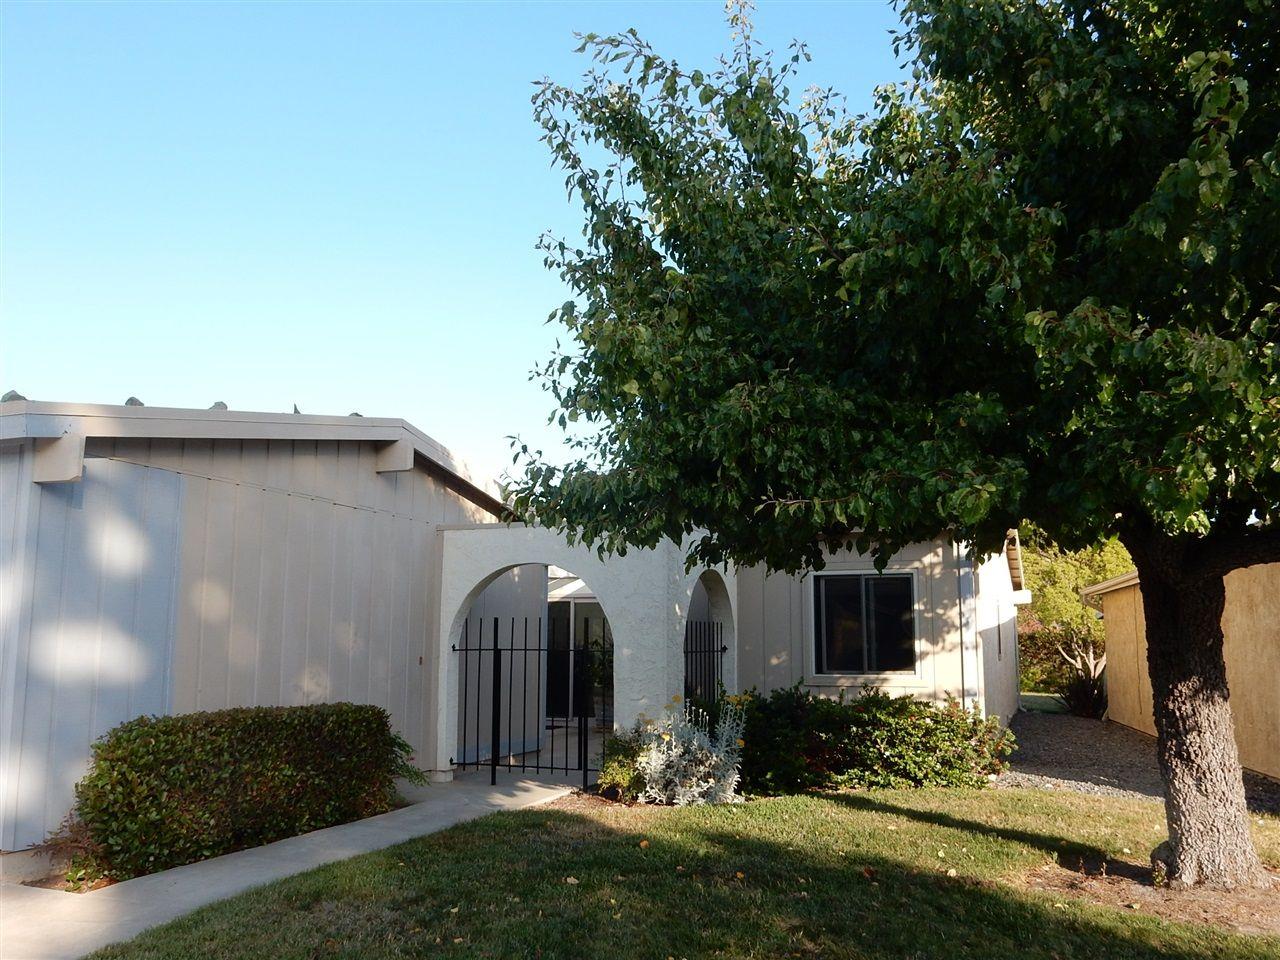 Main Photo: OCEANSIDE House for sale : 2 bedrooms : 3805 Cinnamon Way